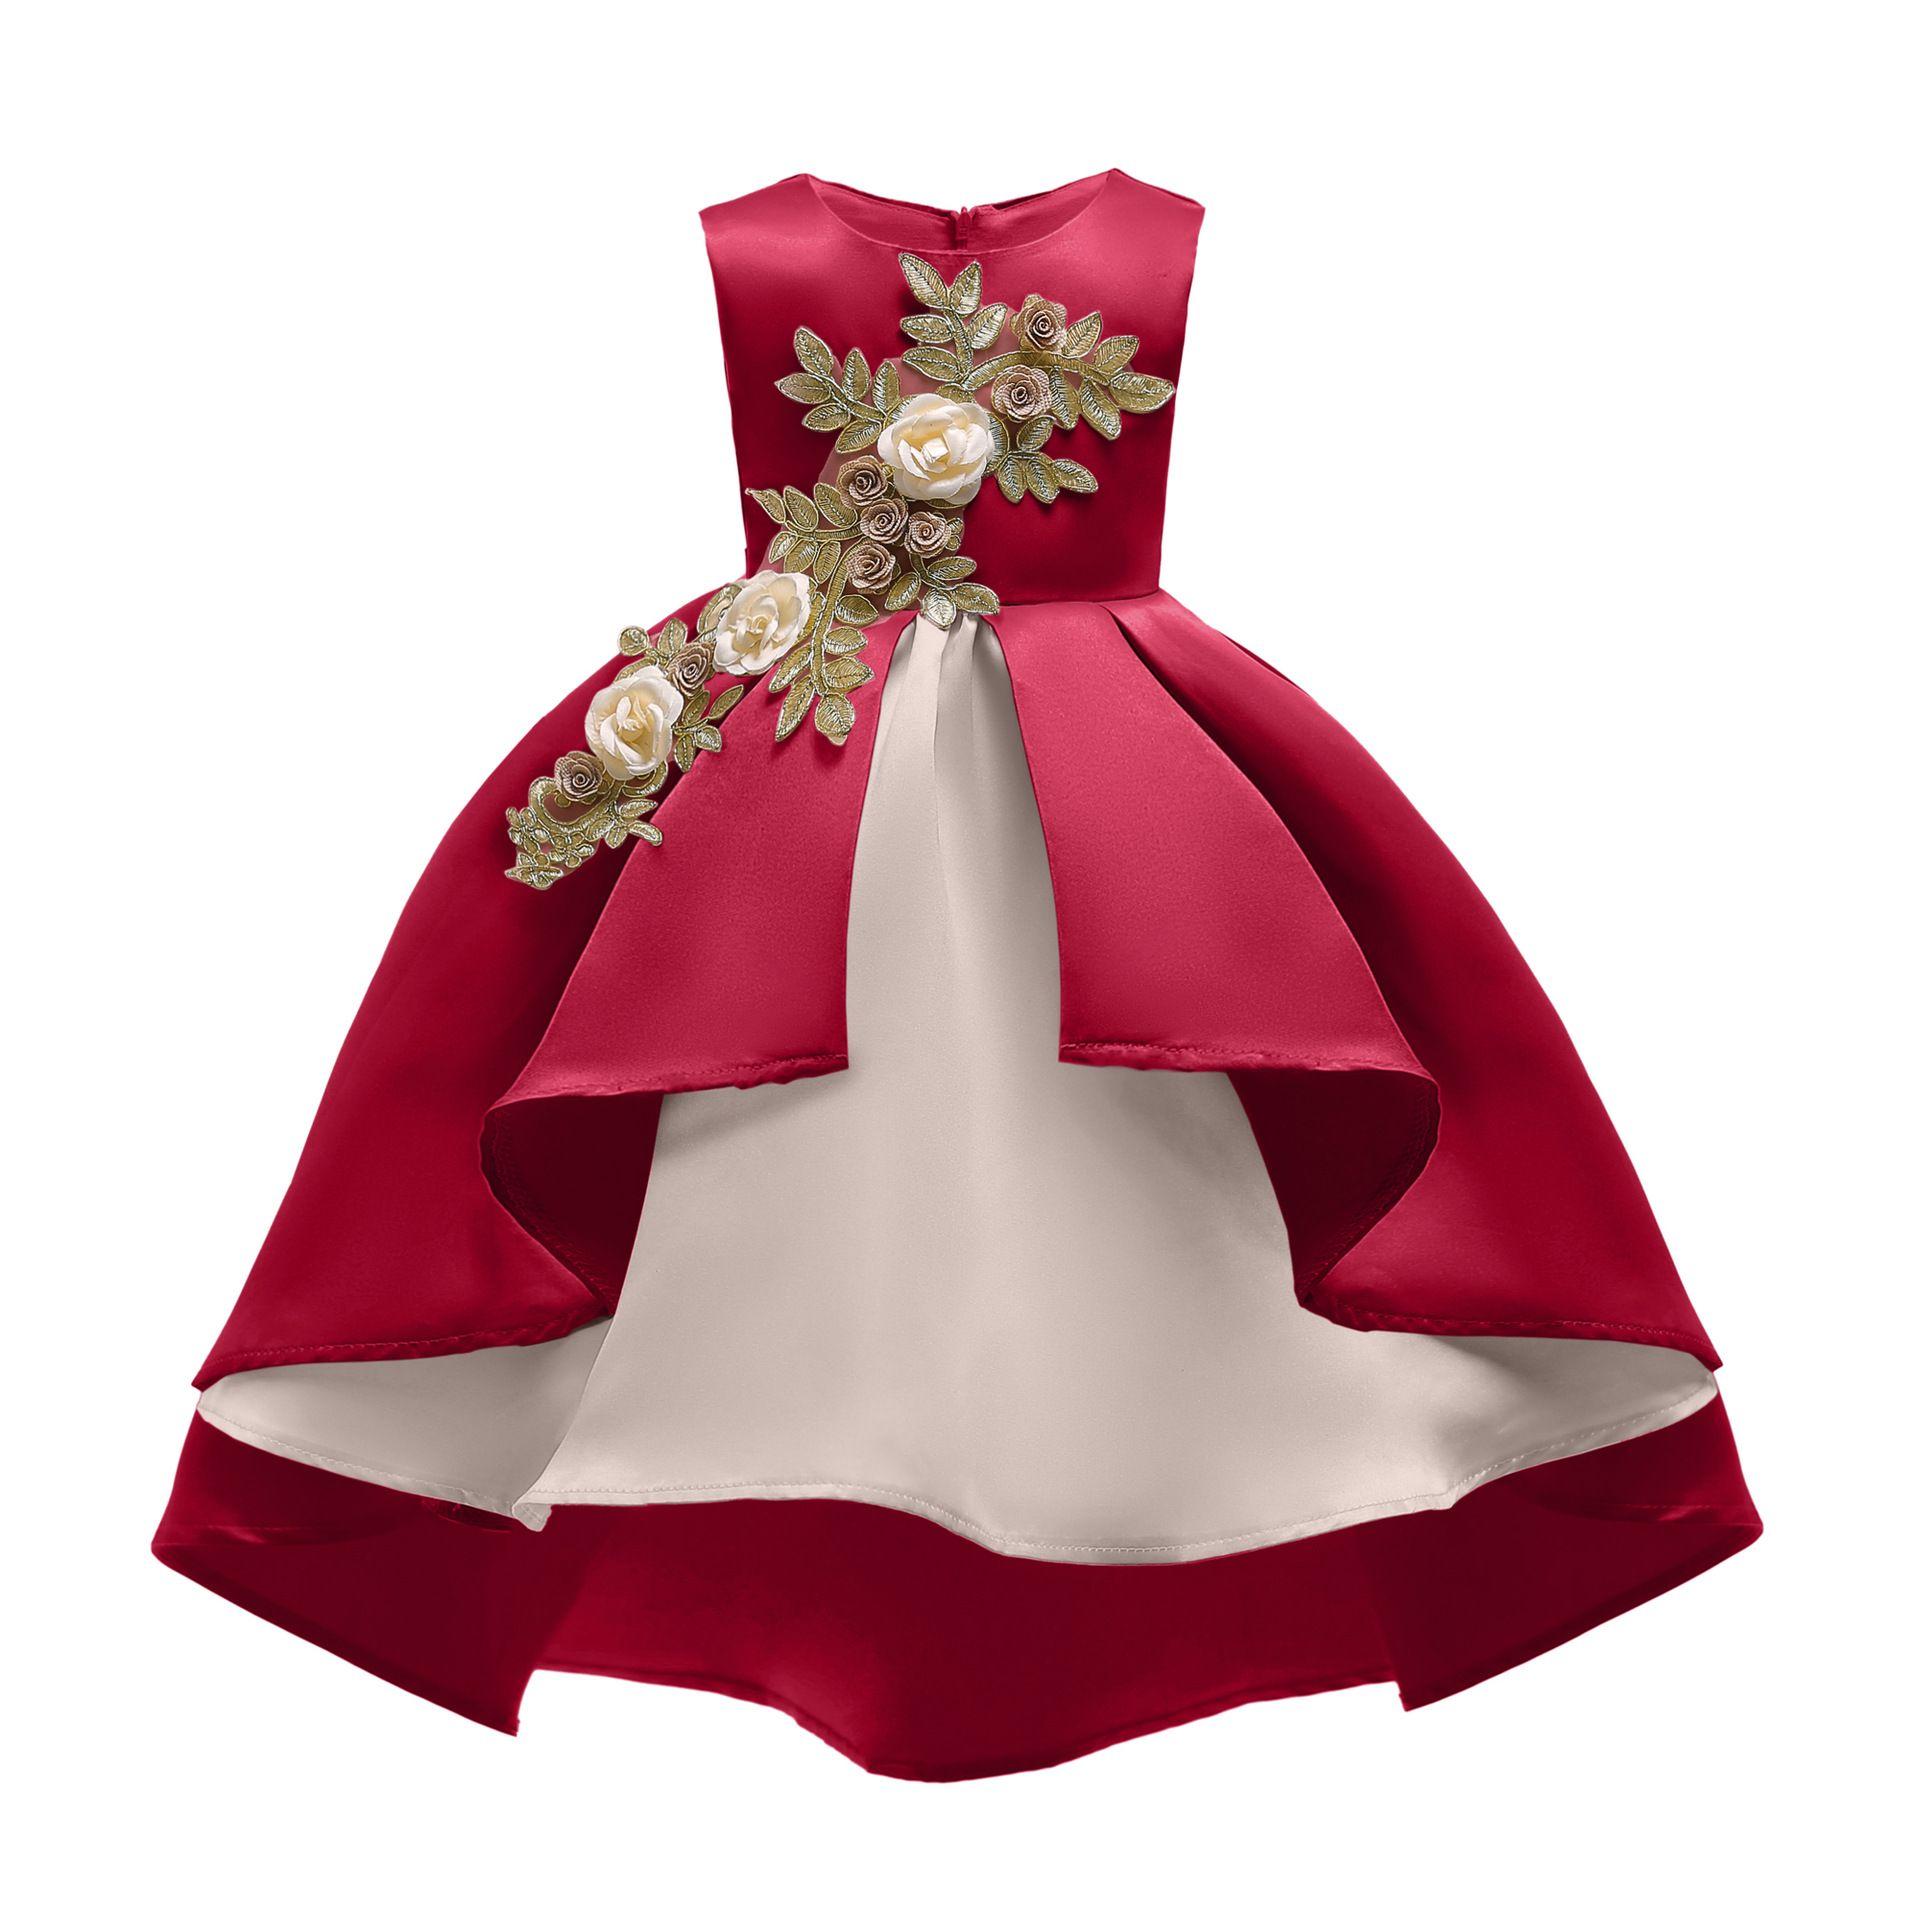 Girls dress fashion new children chirstmas party dresses kids flower dress round neck short sleeve Bows belt princess dress Ball Gown X067